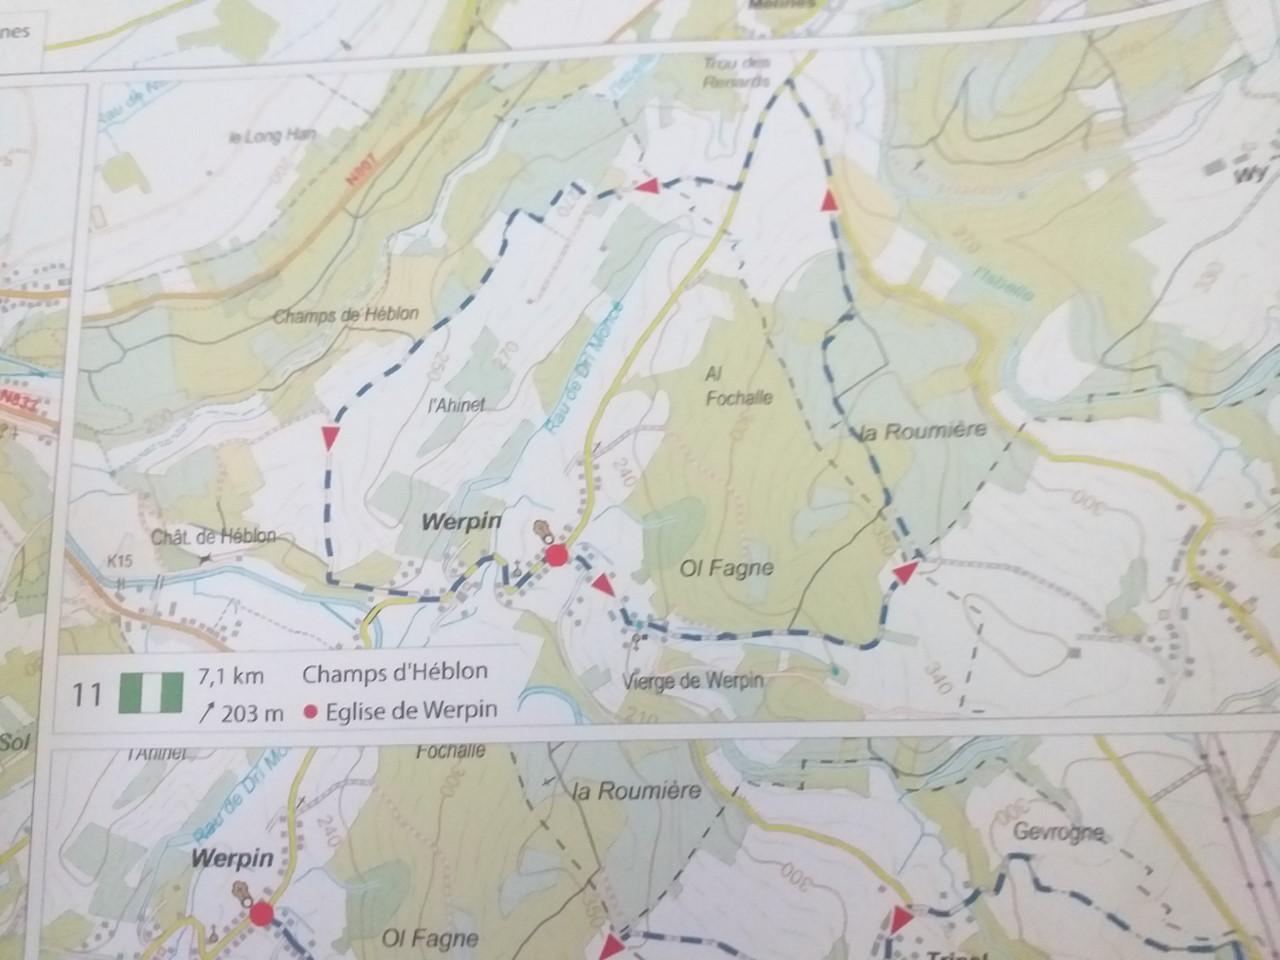 Wandeling n° 11 : Champs d'Heblon